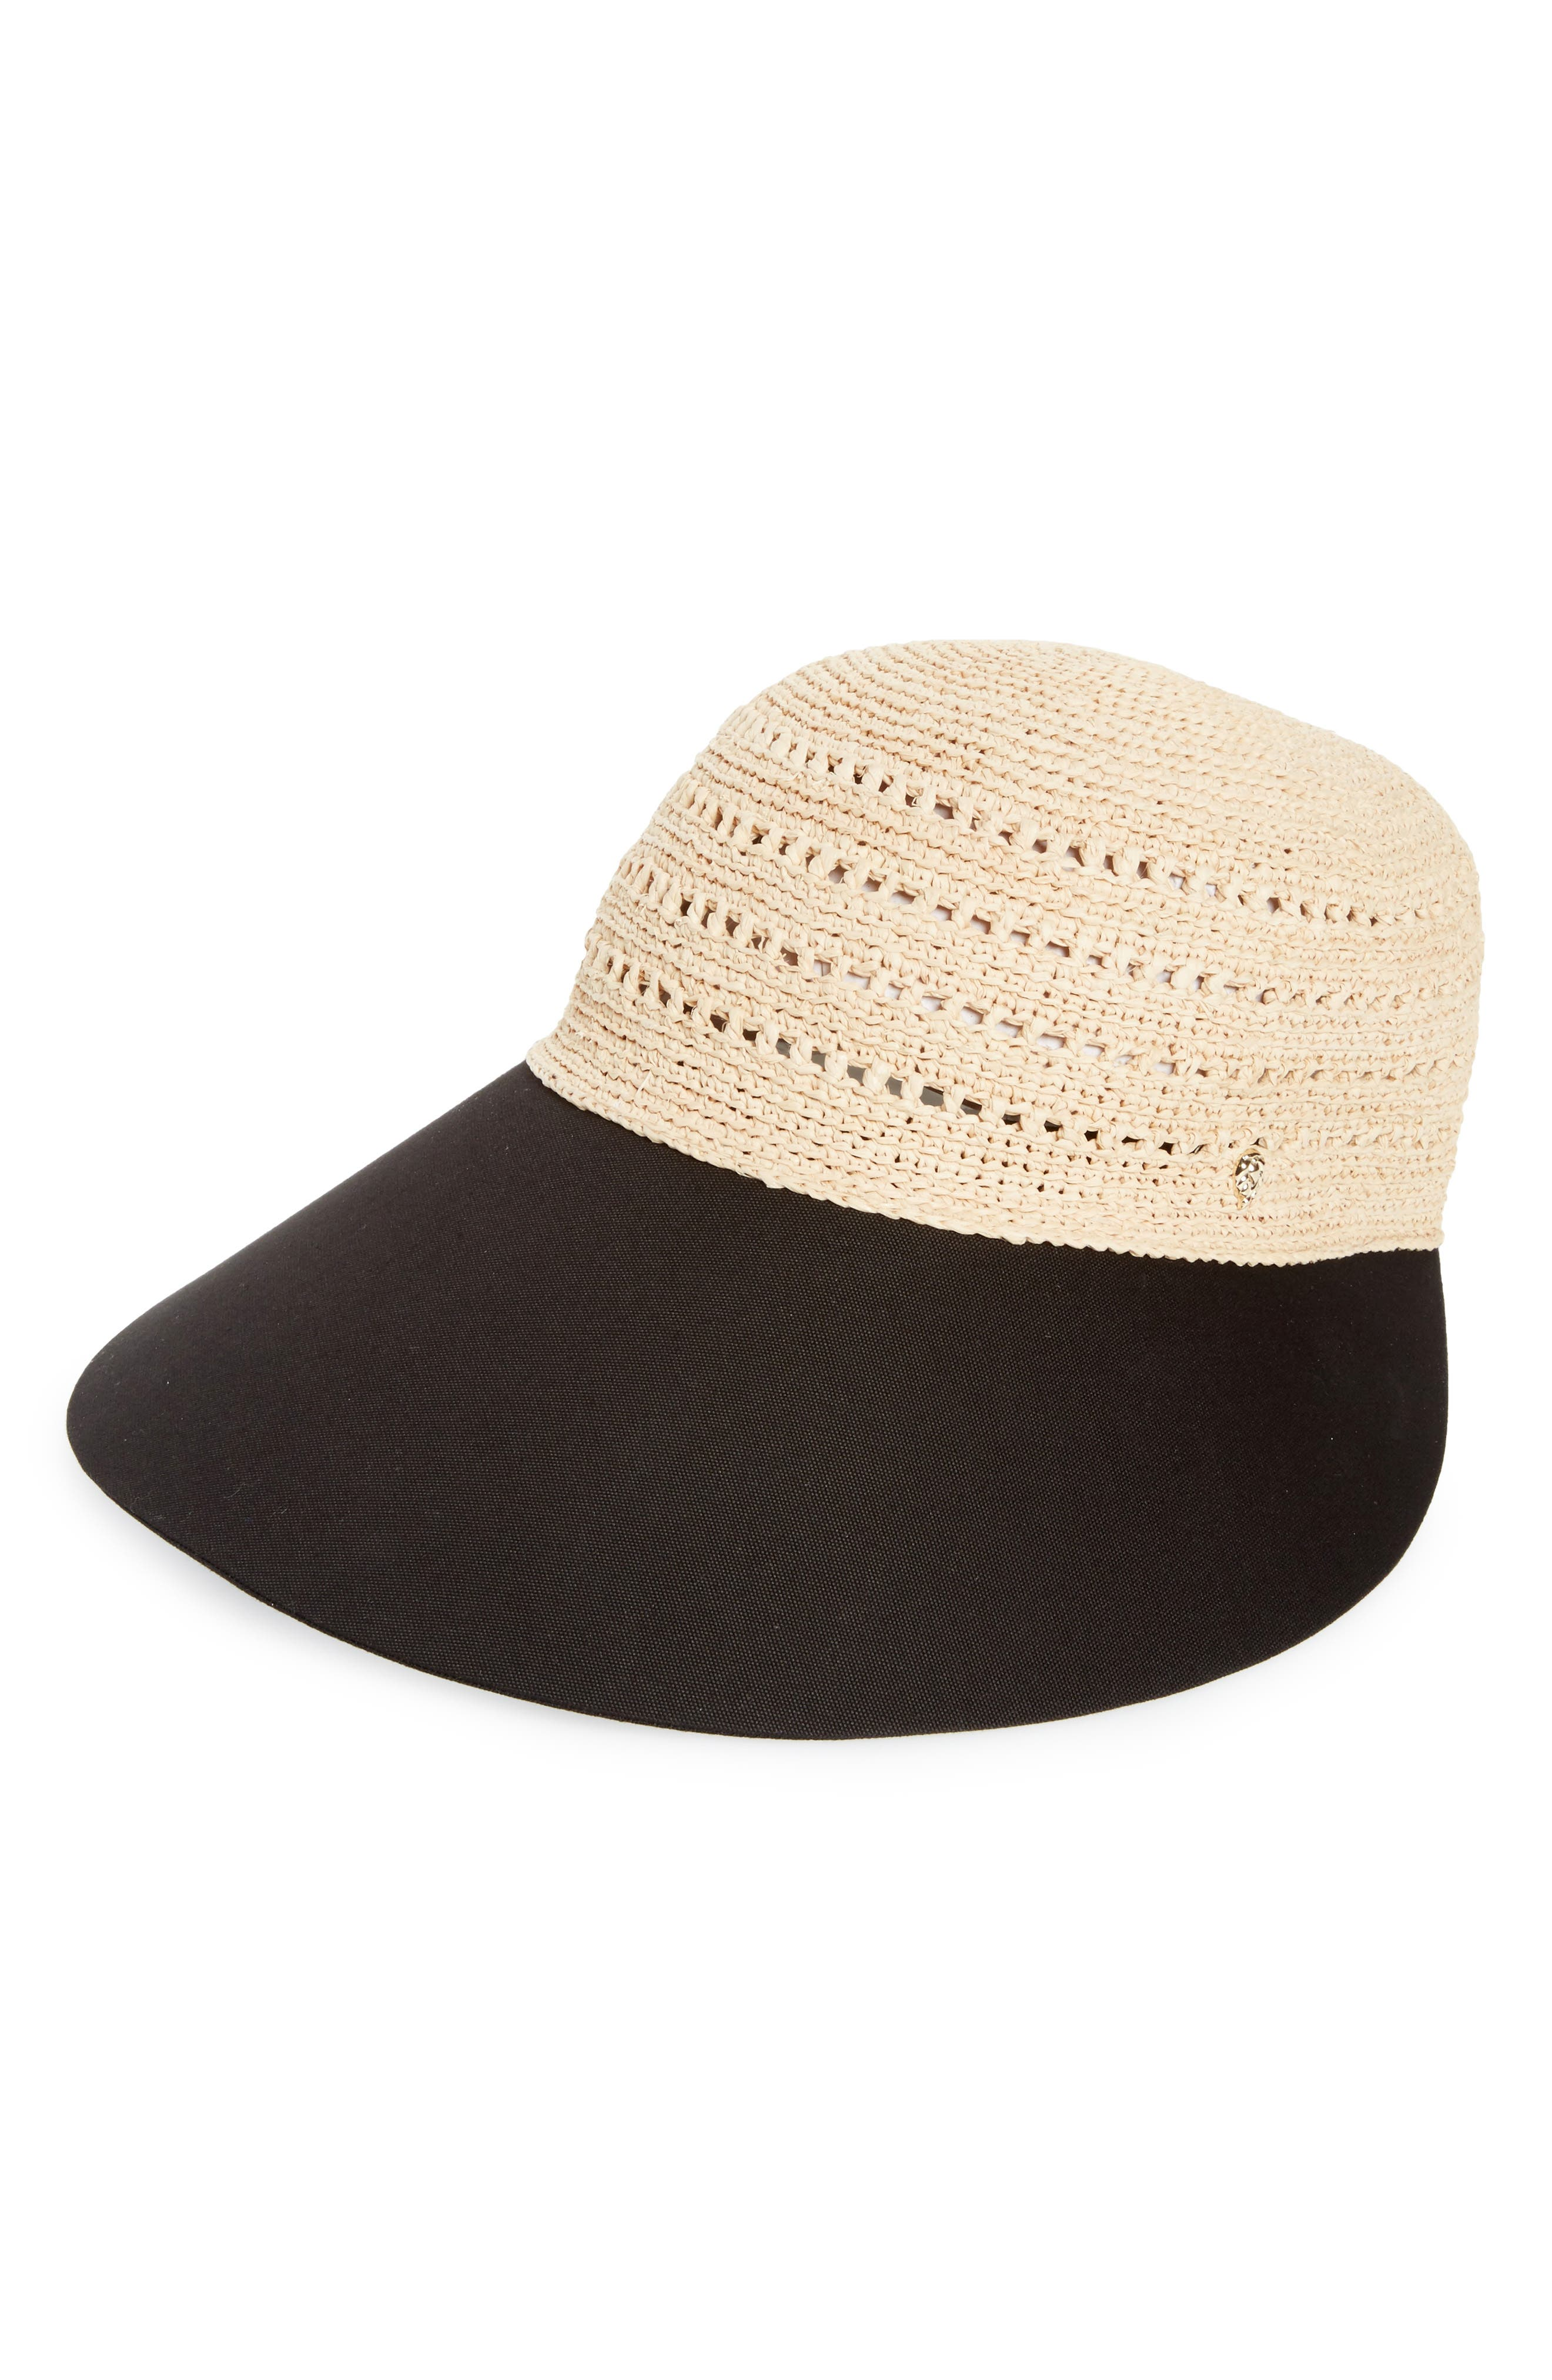 Main Image - Helen Kaminski Raffia Hat